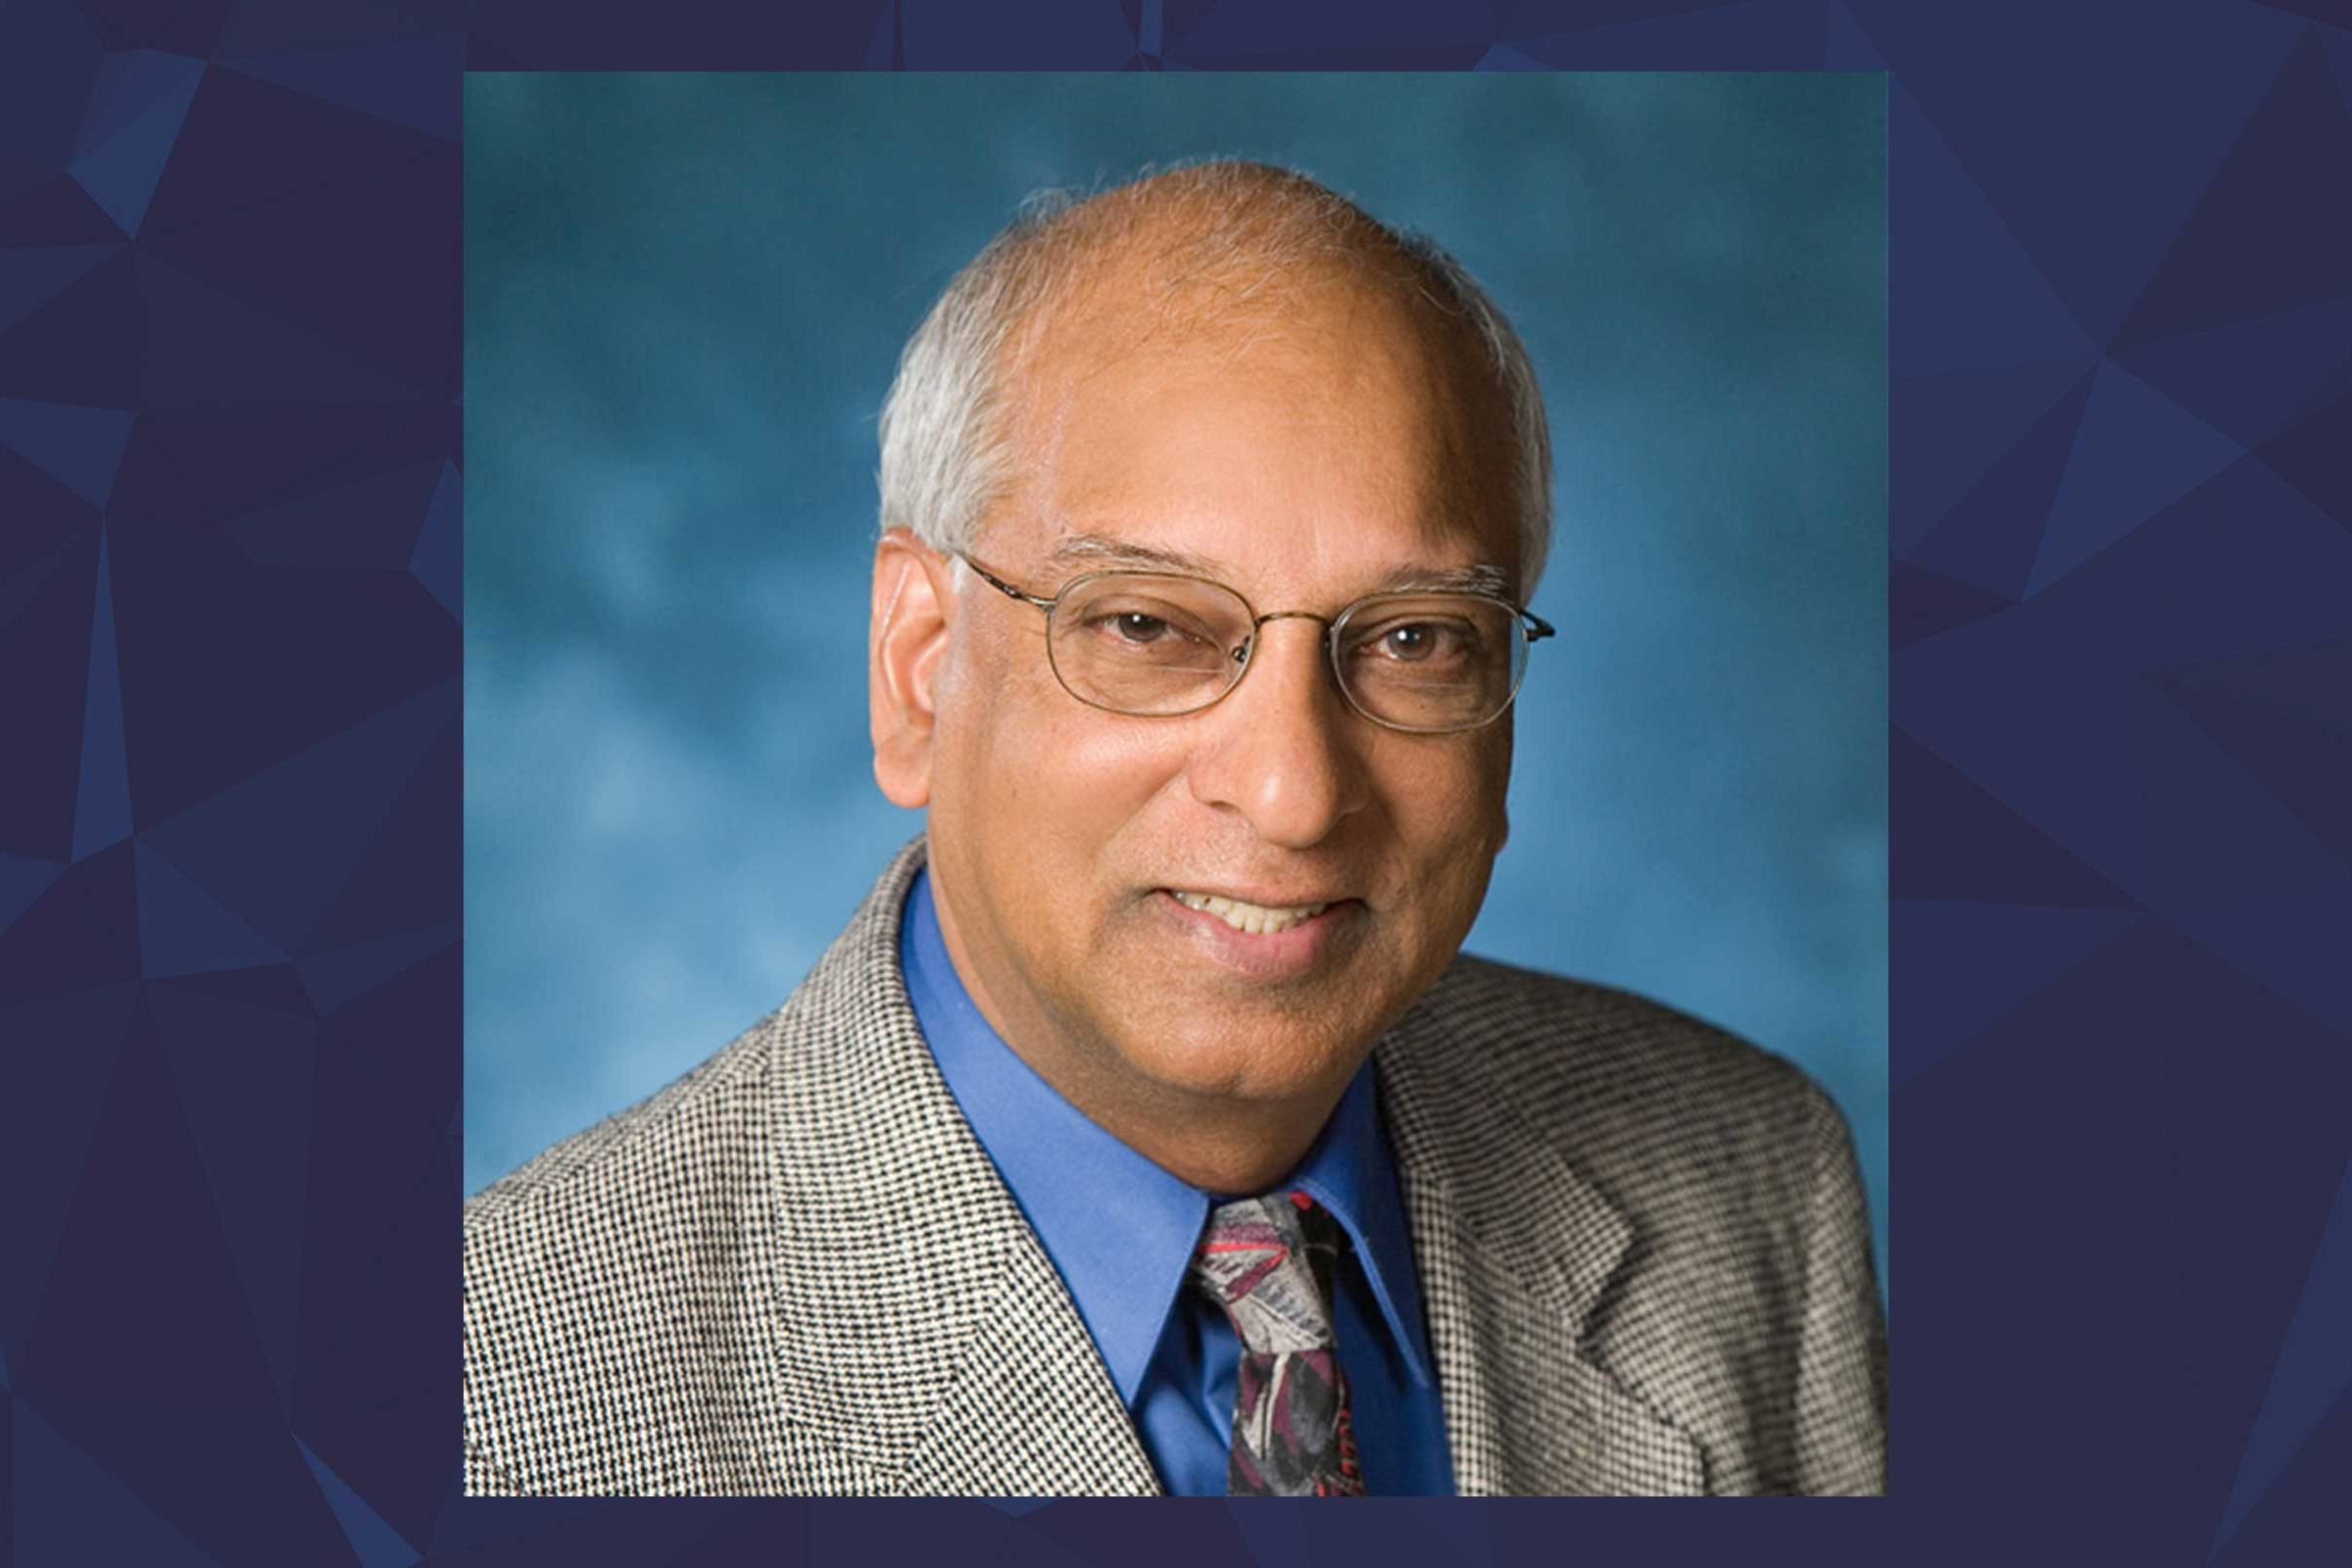 Prof. Sushil Atreya